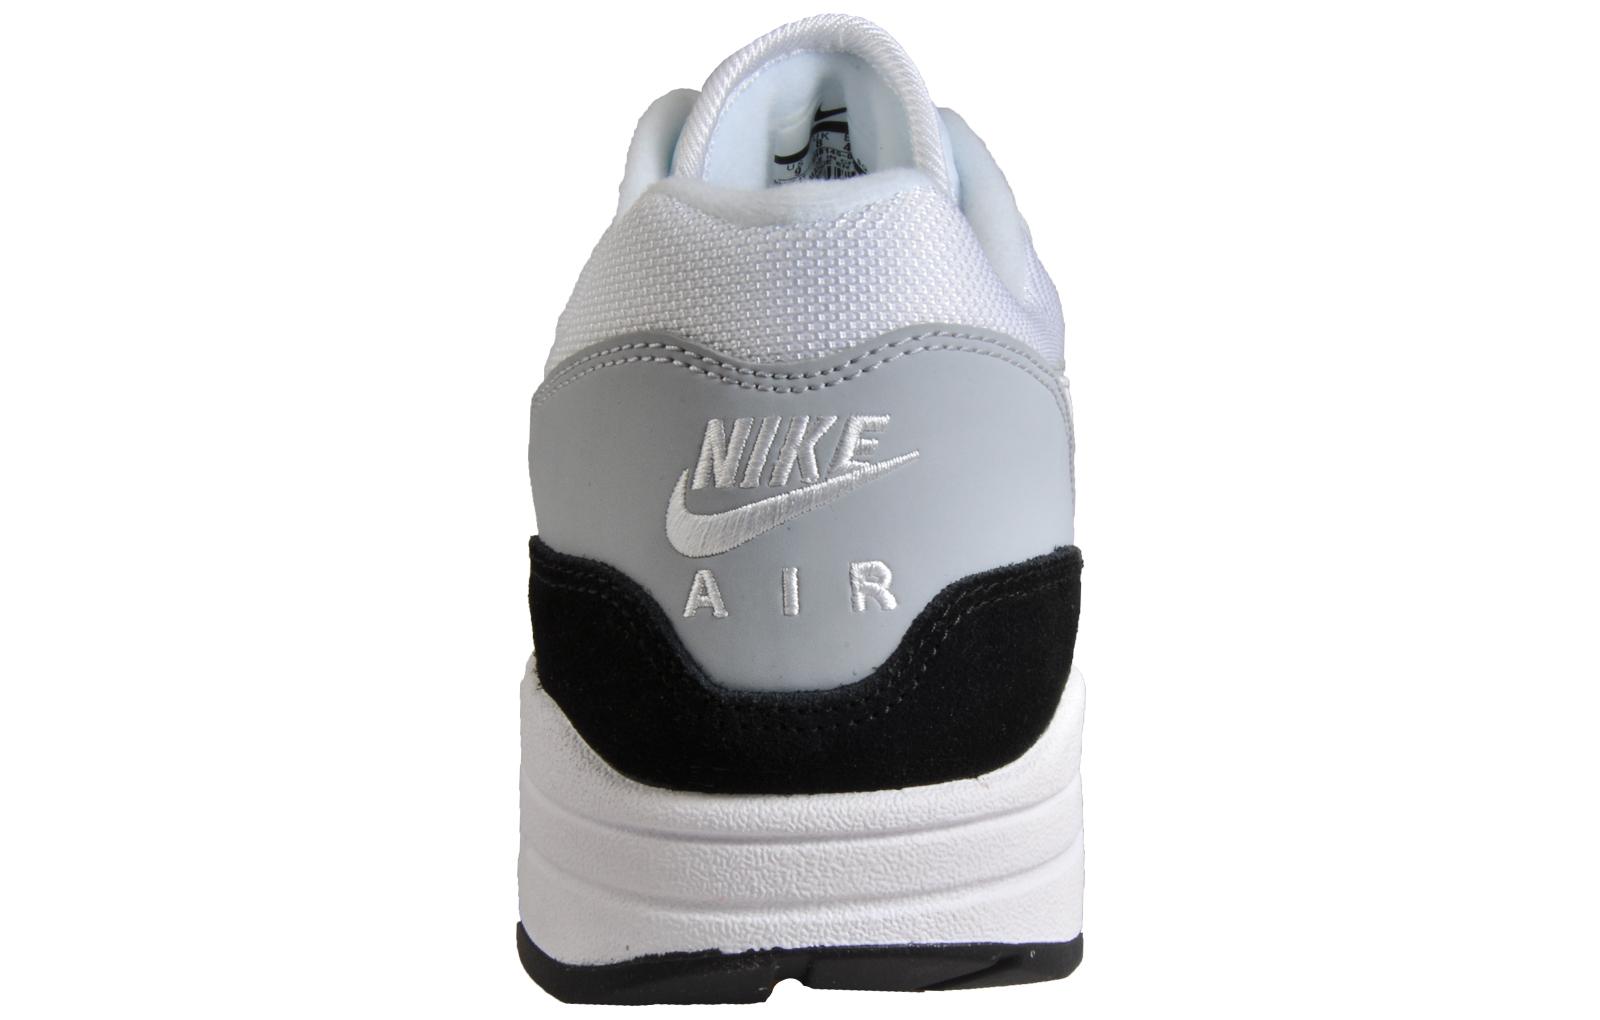 Nike Air Max 1 Premium Men s Casual Retro Sneakers Trainers  e0aafcc2d10